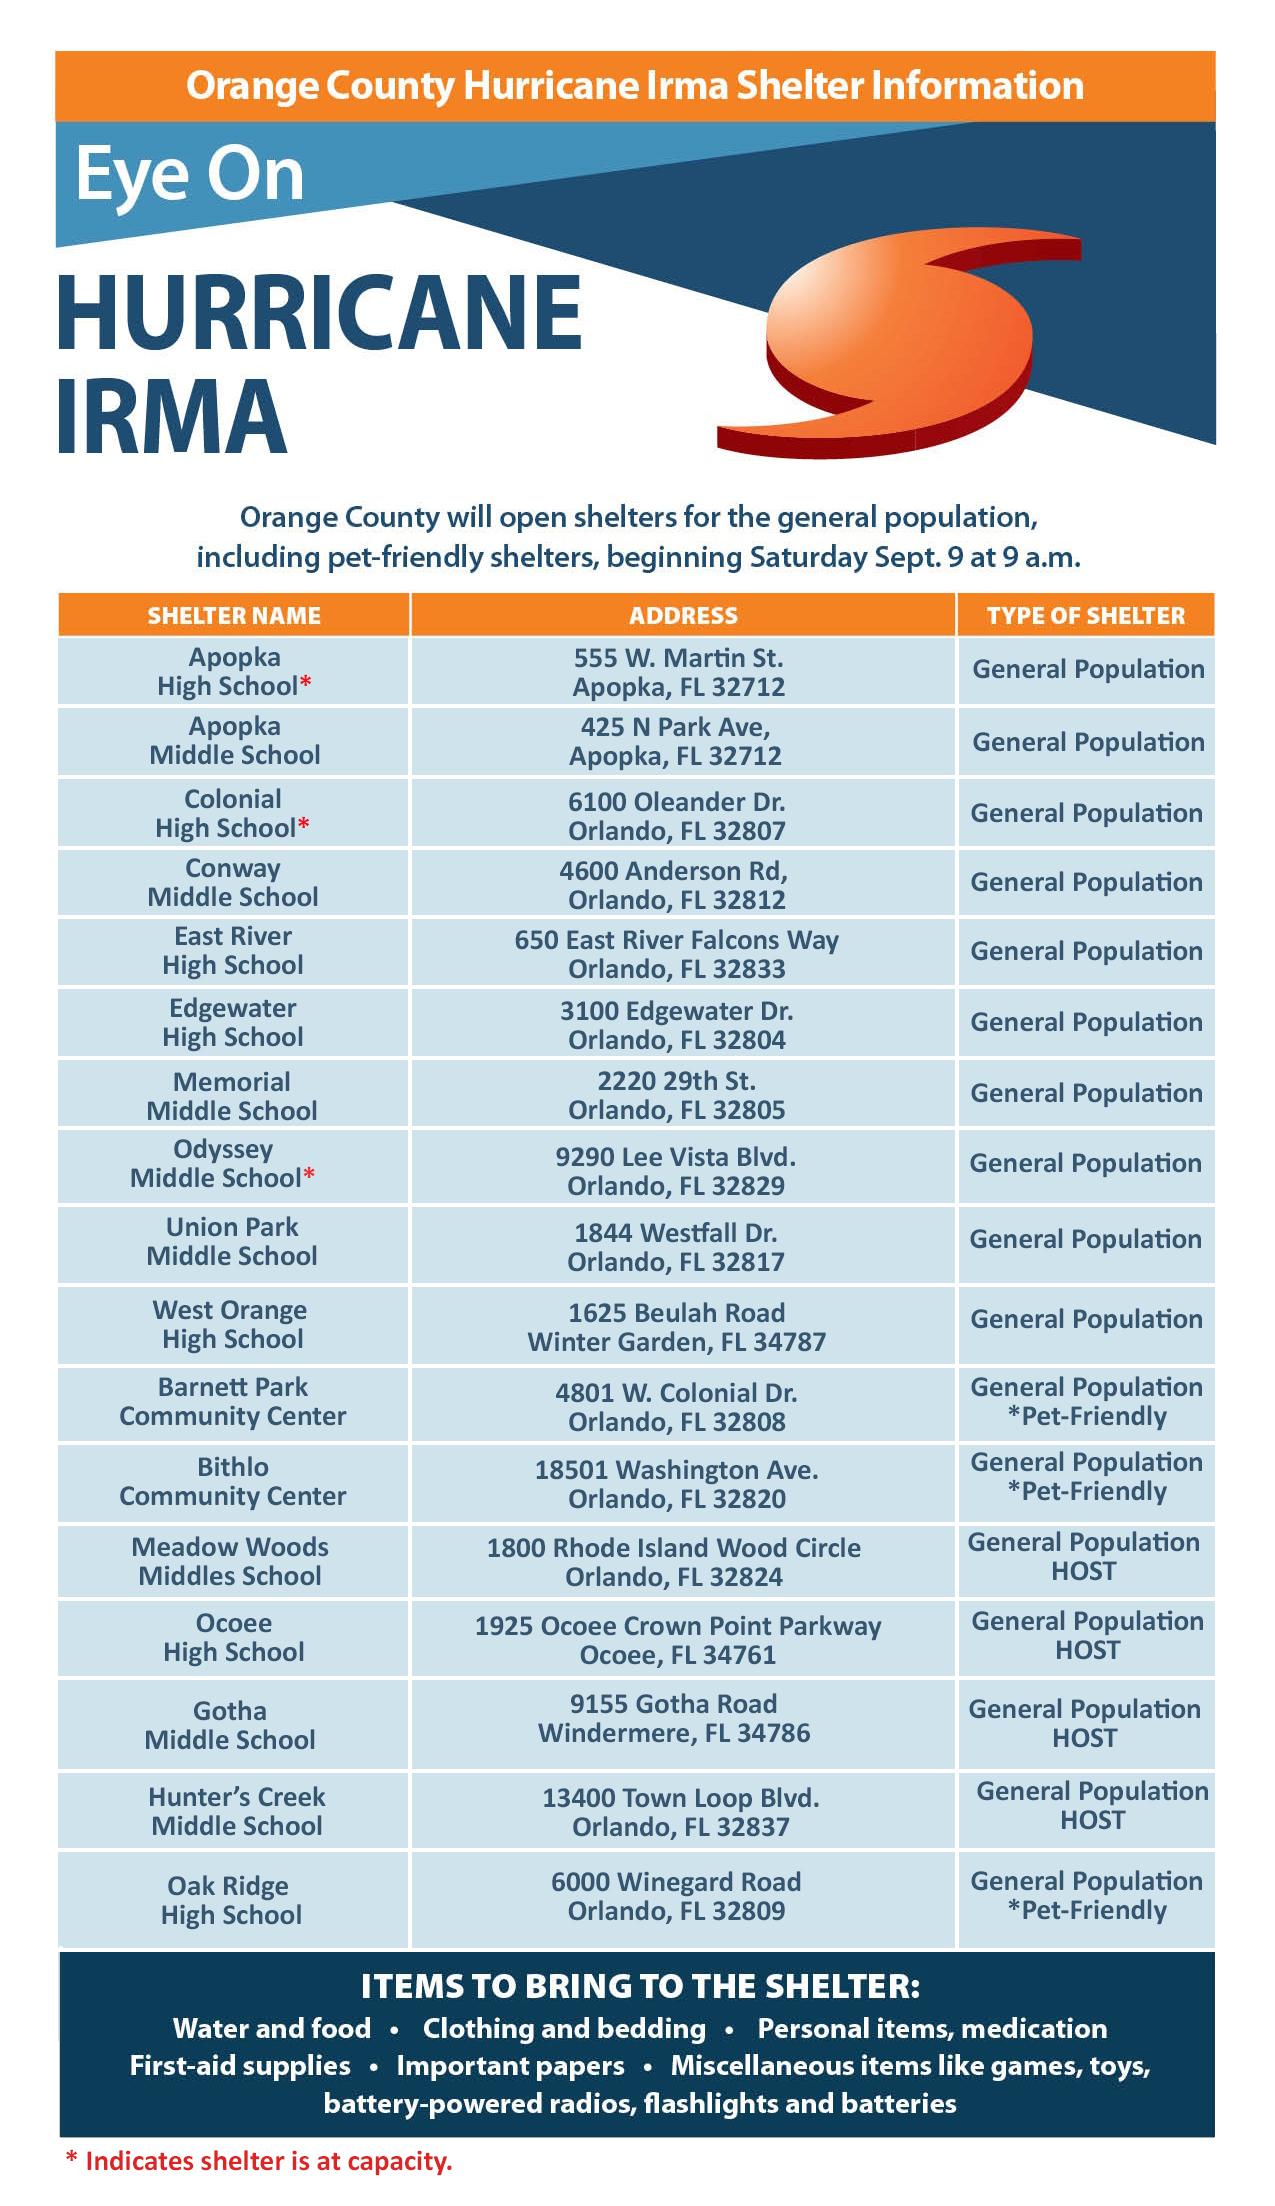 orange county issues mandatory evacuation notice for residents of